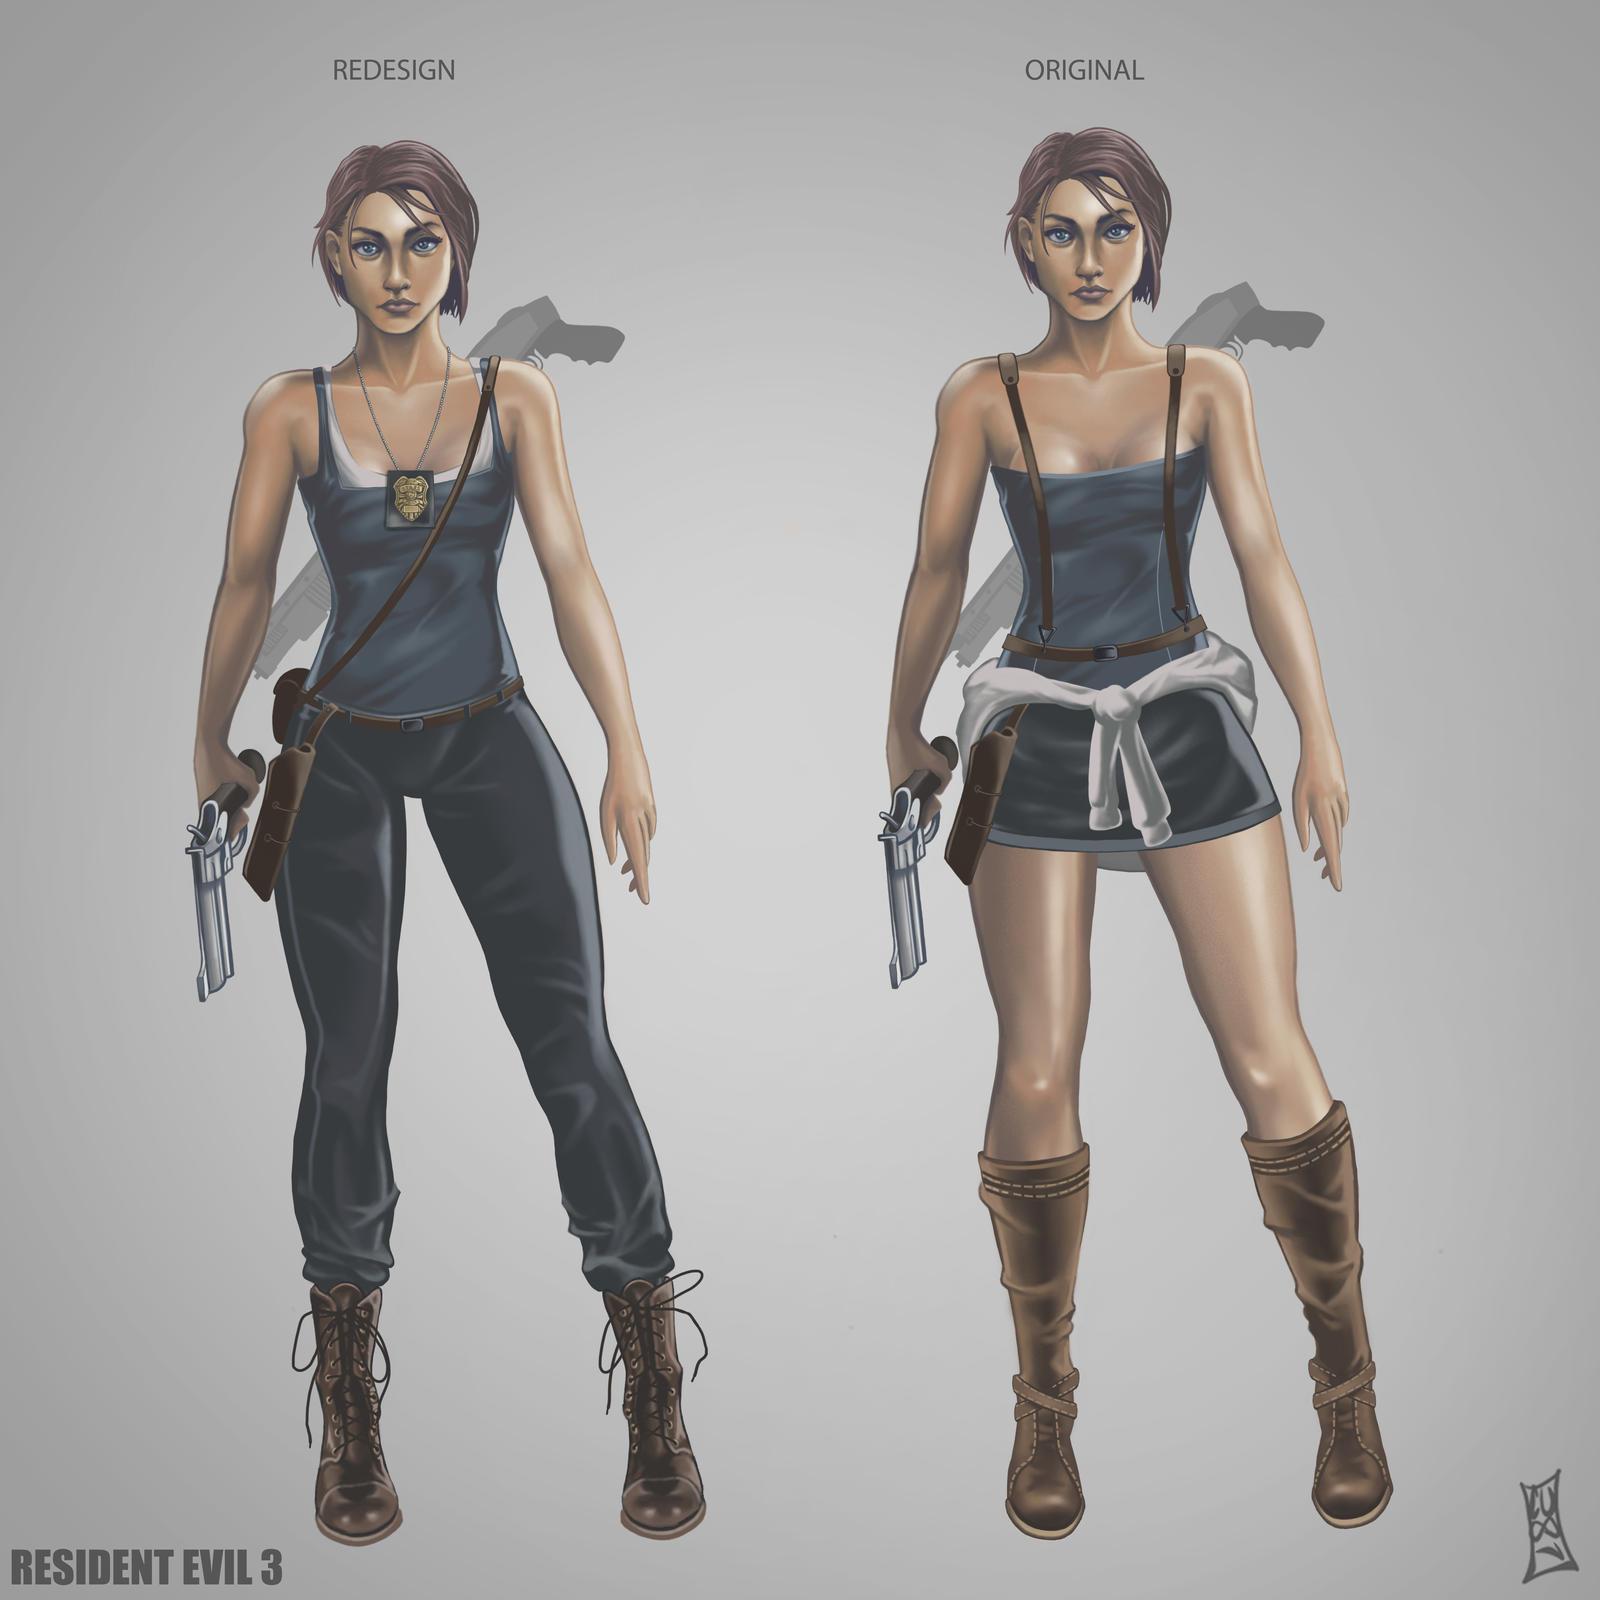 Resident Evil 3 Remake Jill Concept By Code Umb87 On Deviantart